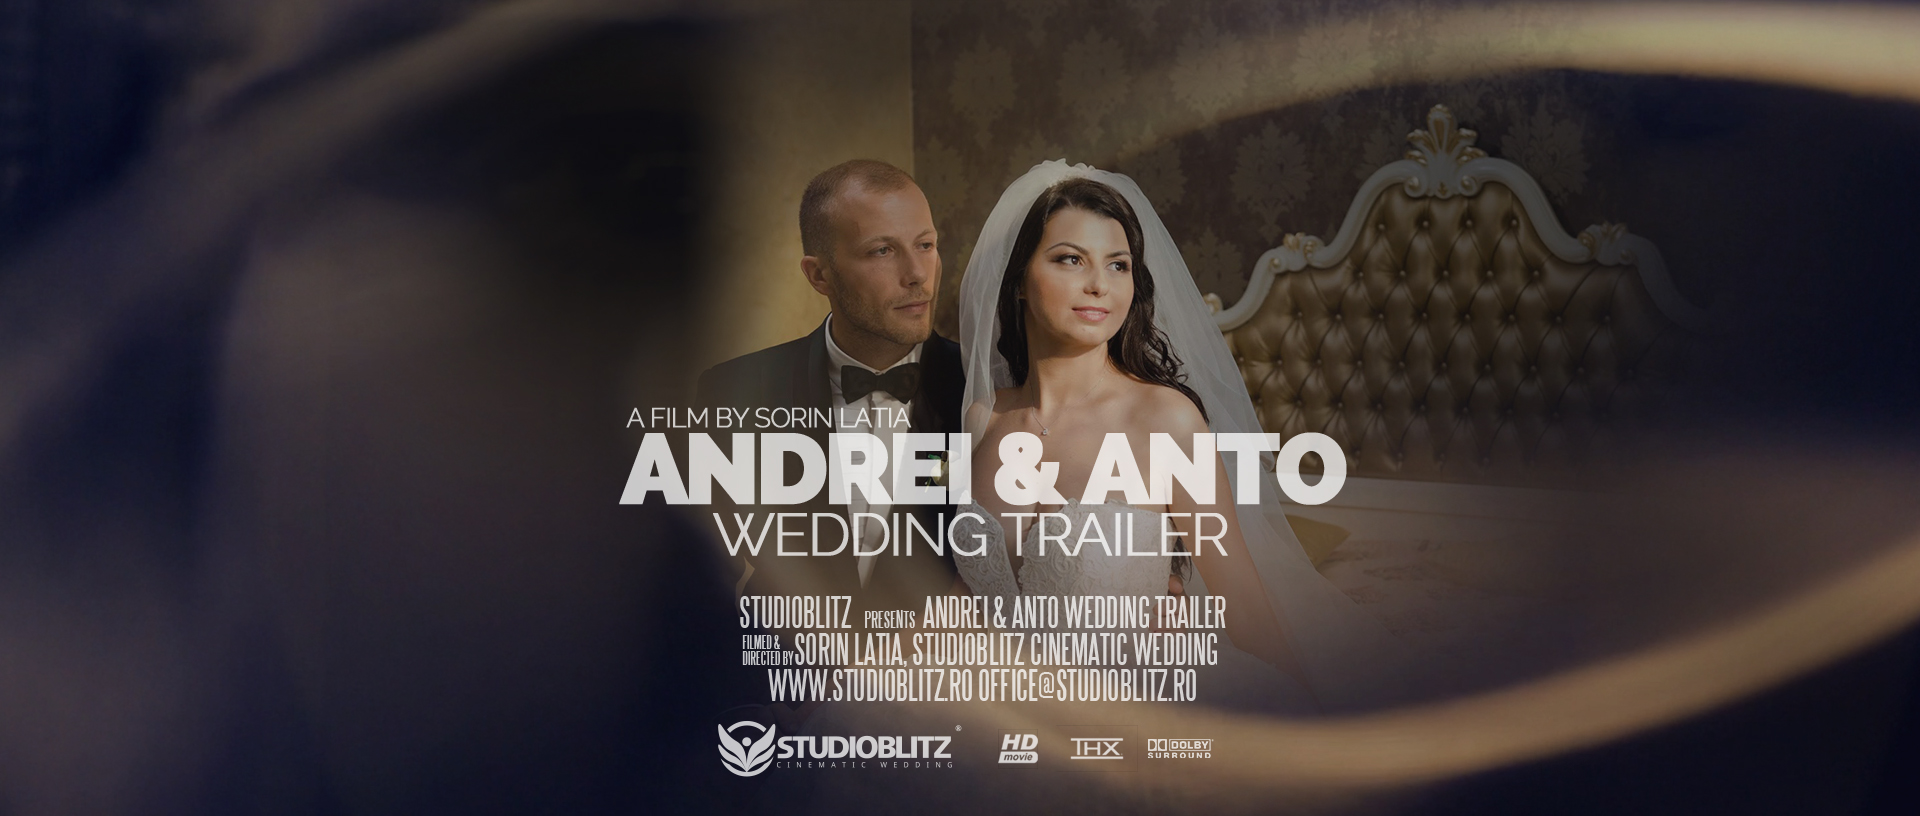 coperta-filmari-profesionale-craiova-andrei-anto-wedding-trailer